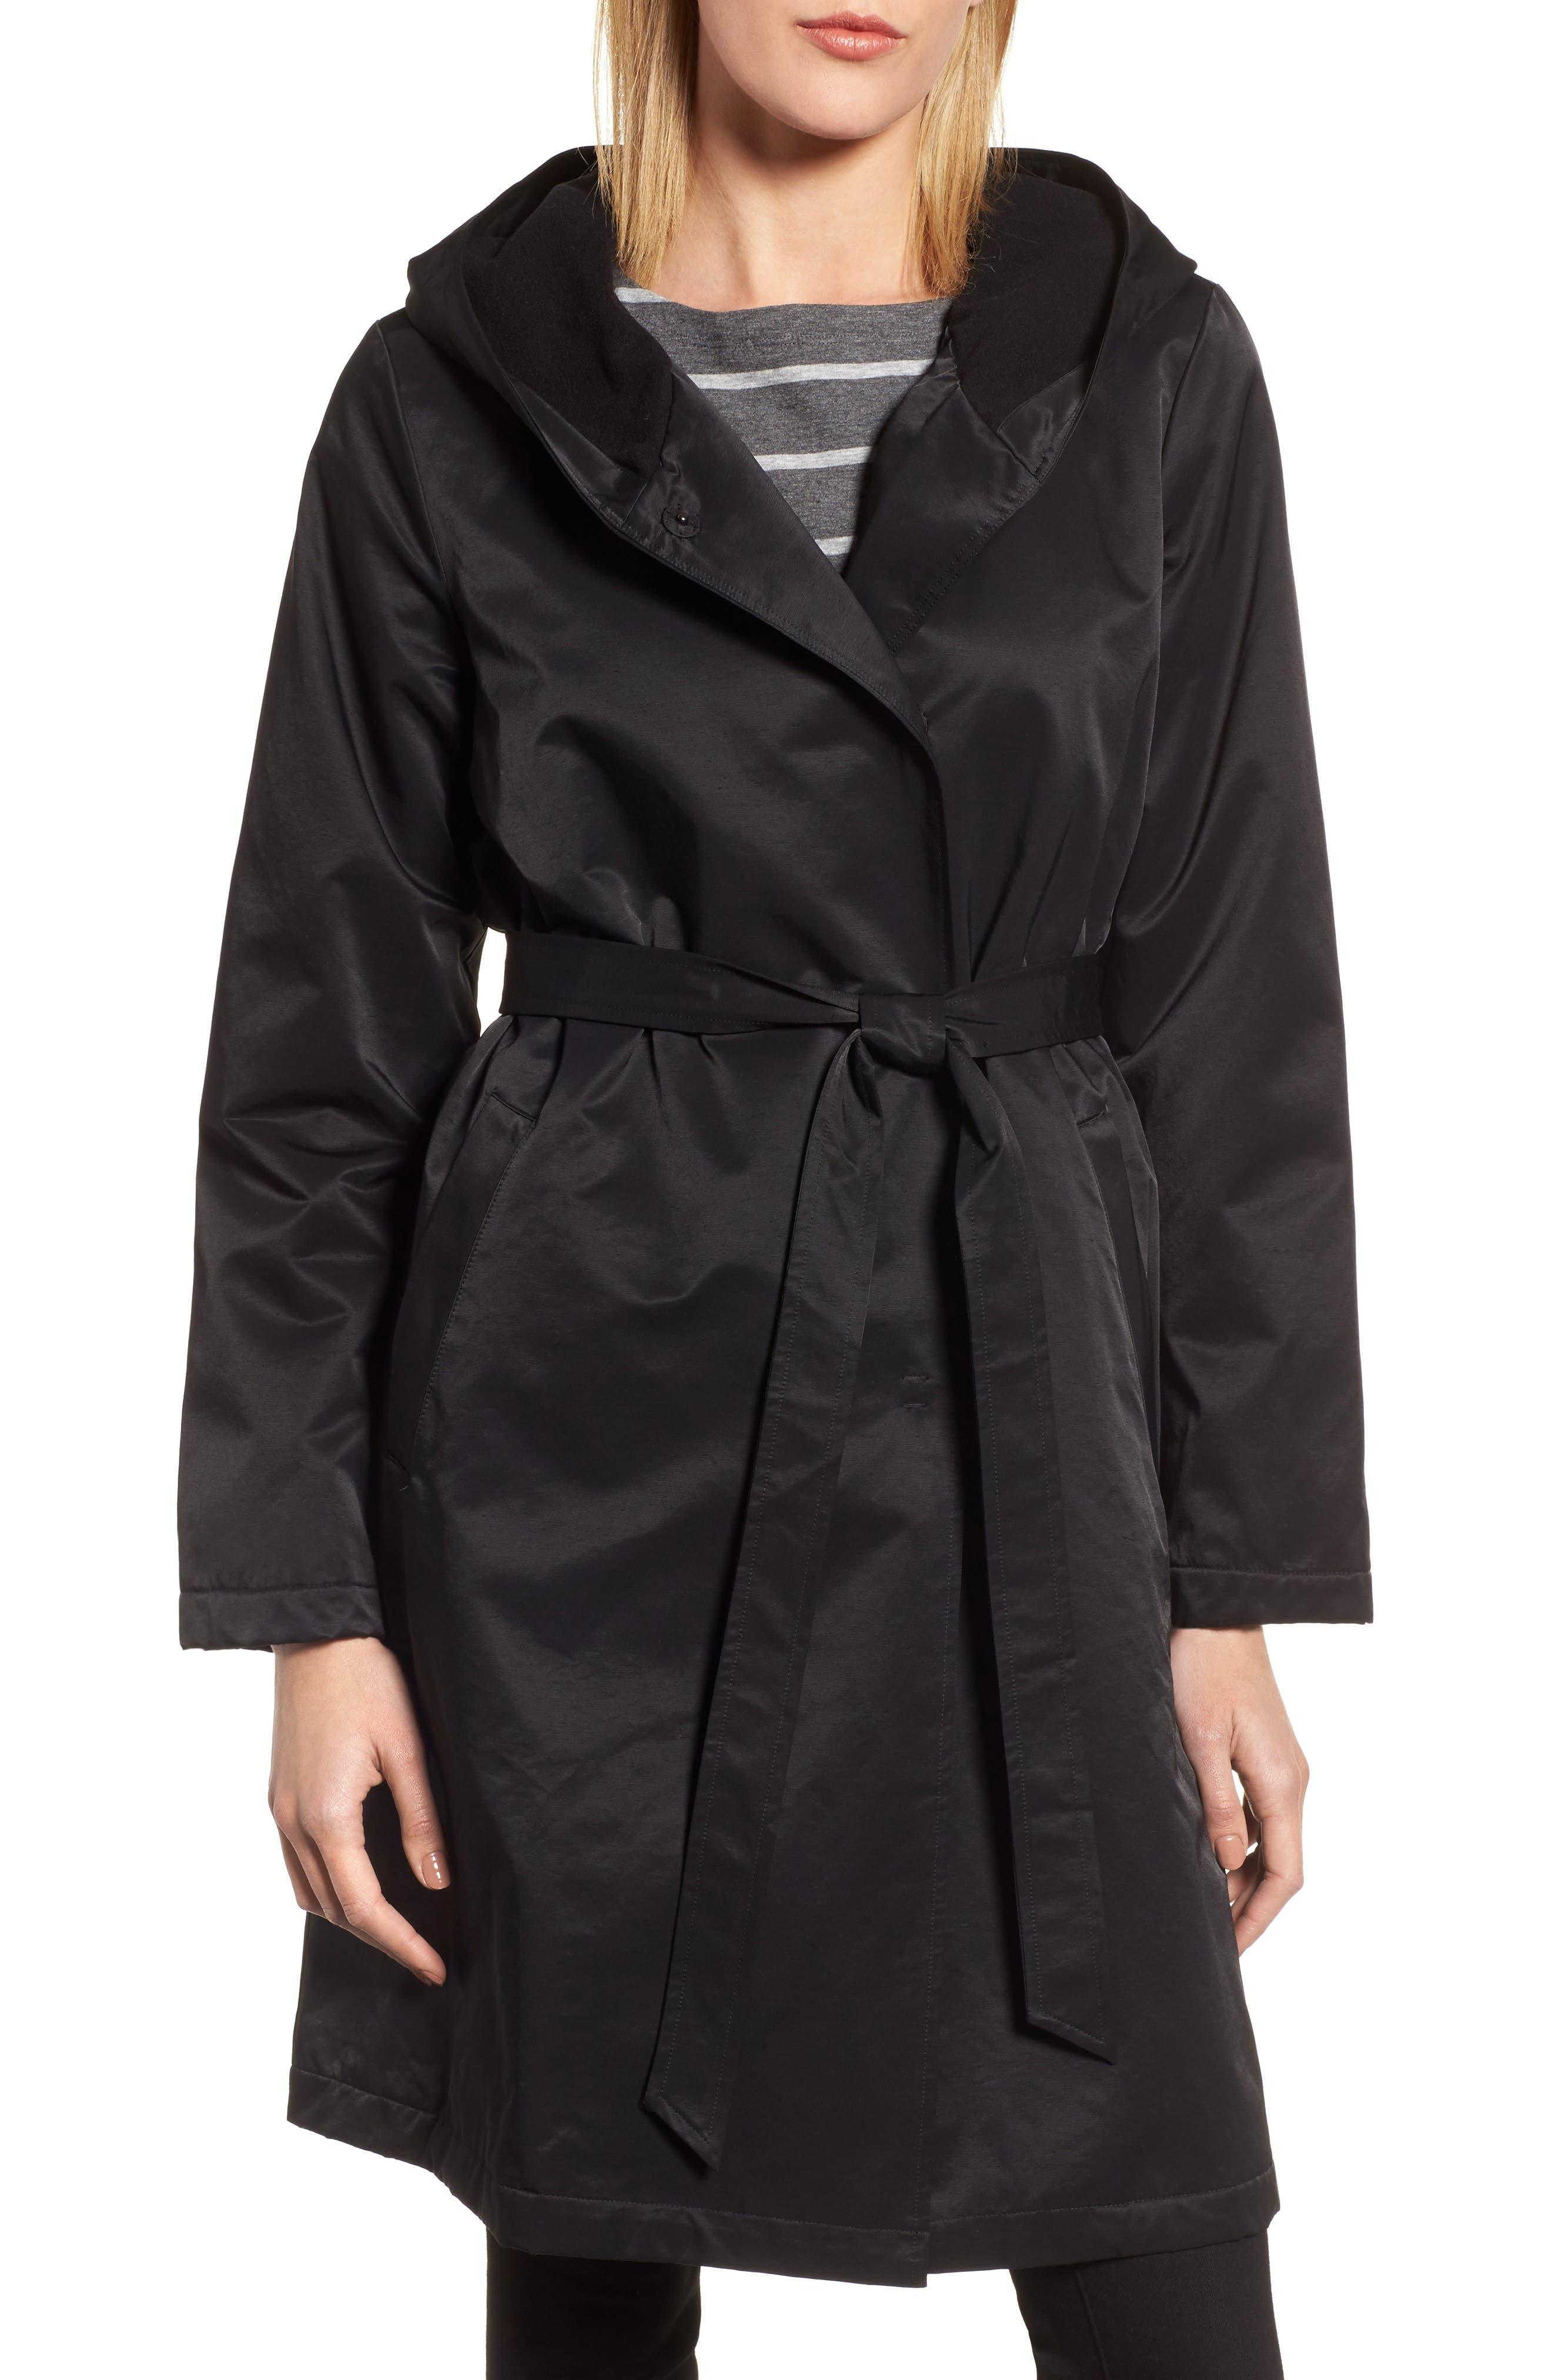 Eileen Fisher Fleece Lined Hooded Coat